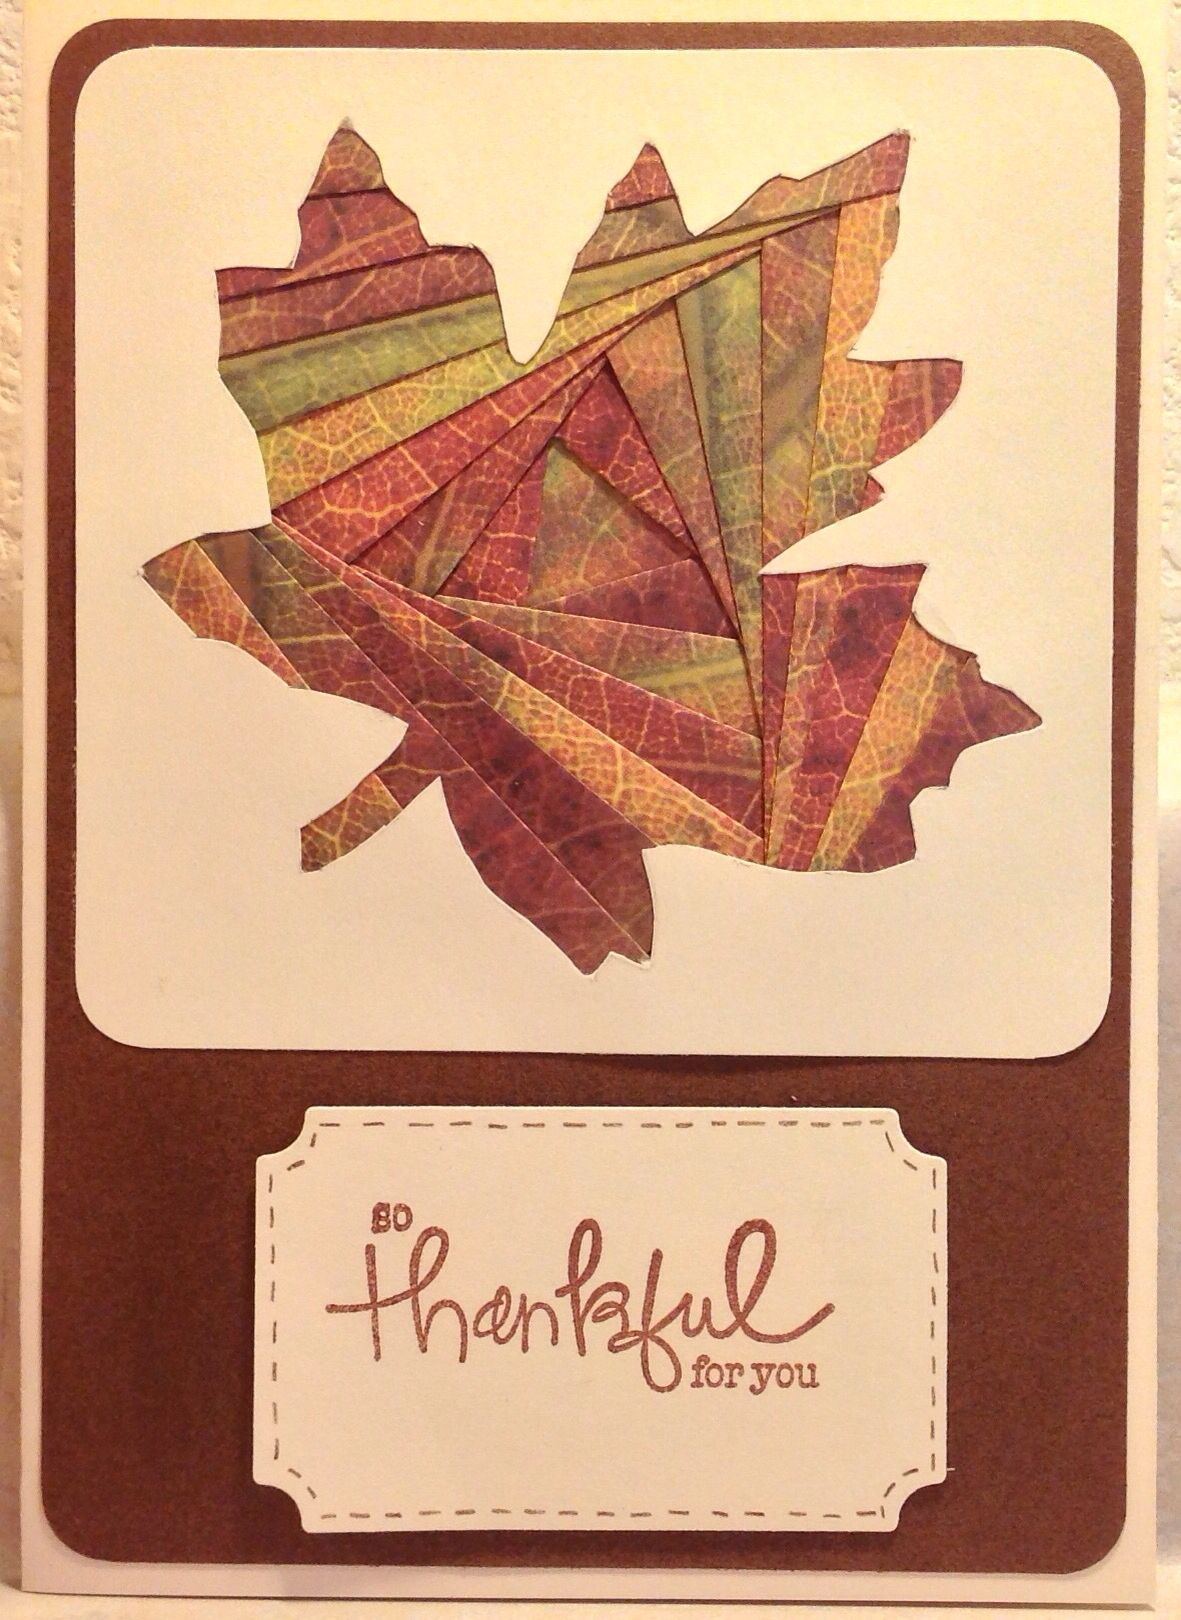 Iris Folded Fall Leaf Card | Iris folding cards. | Pinterest ...